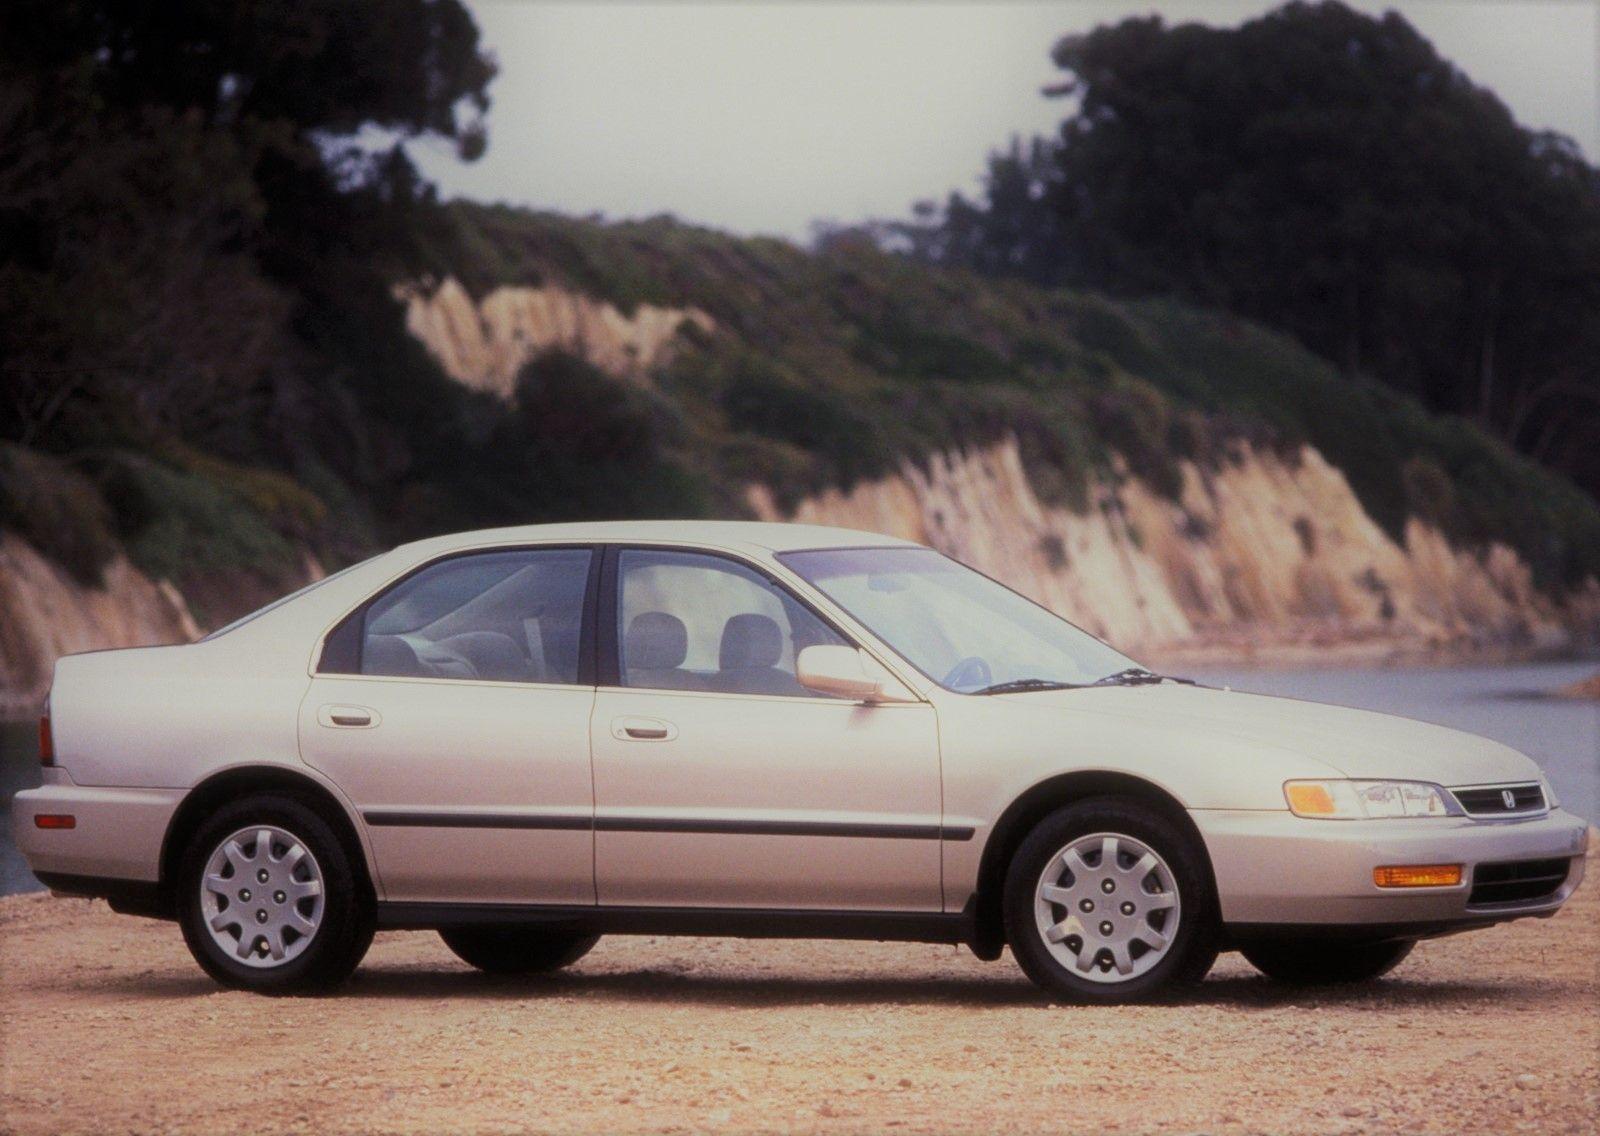 Pin on East evolution car